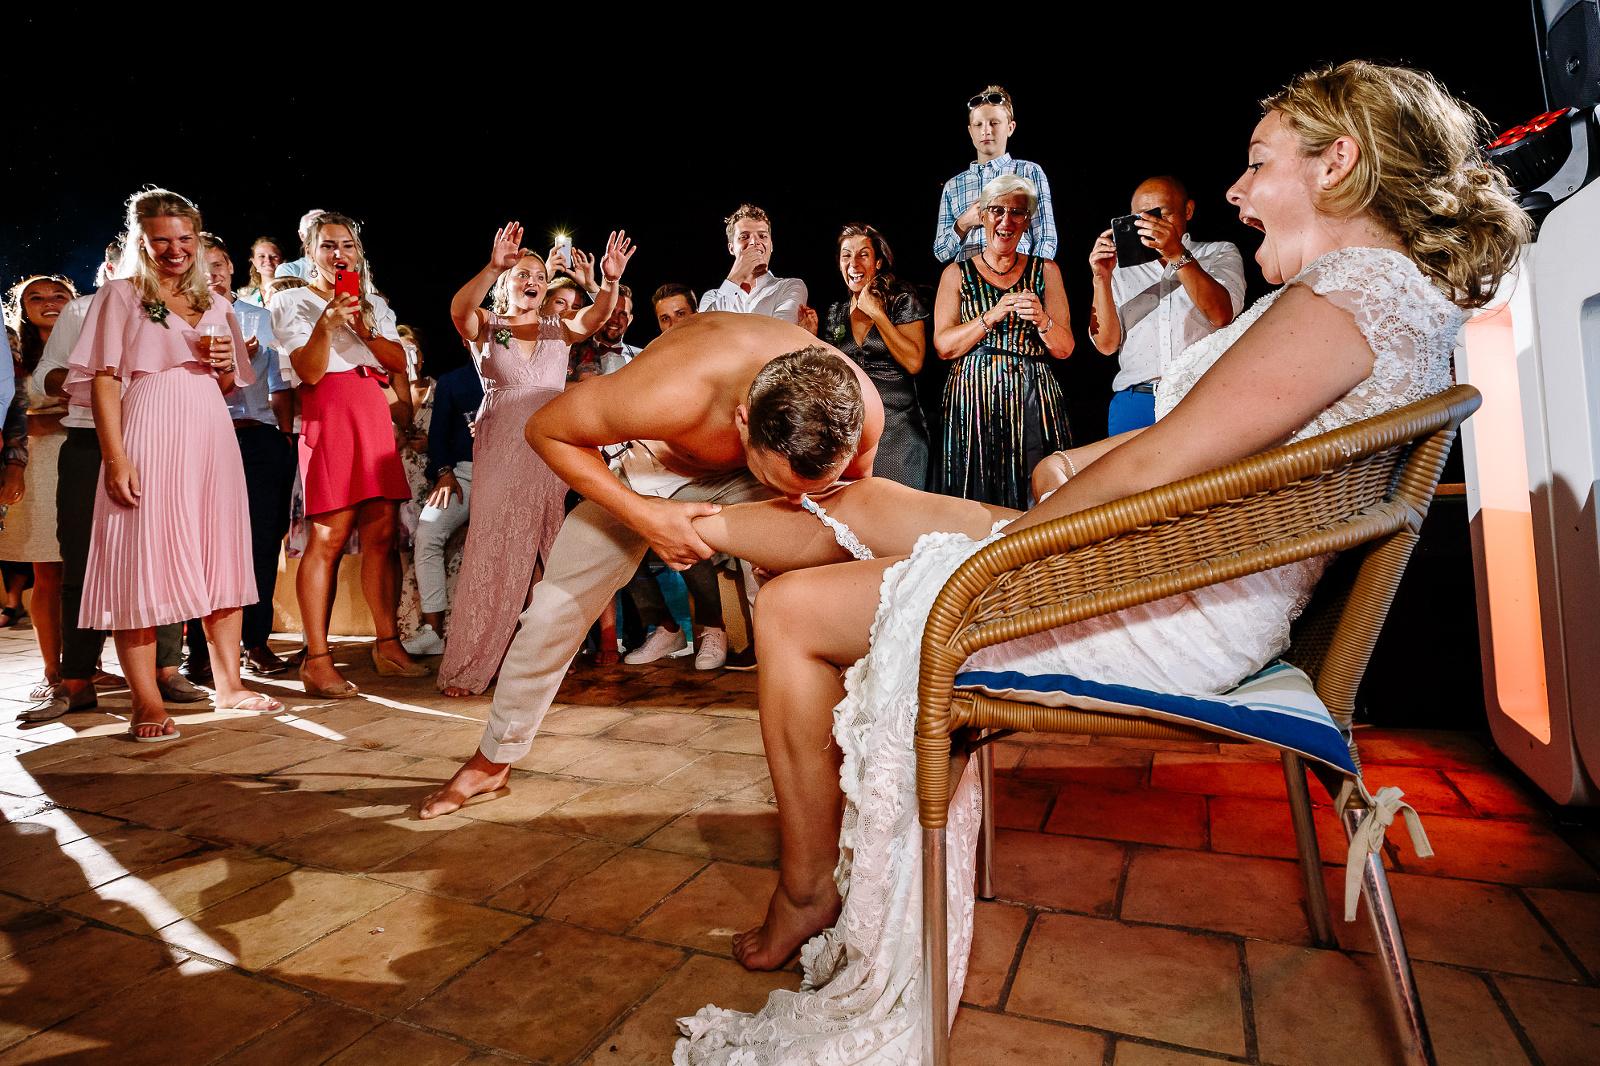 Master Award, bruidsfotografie, trouwen, trouwfotograaf, buitenland trouwen